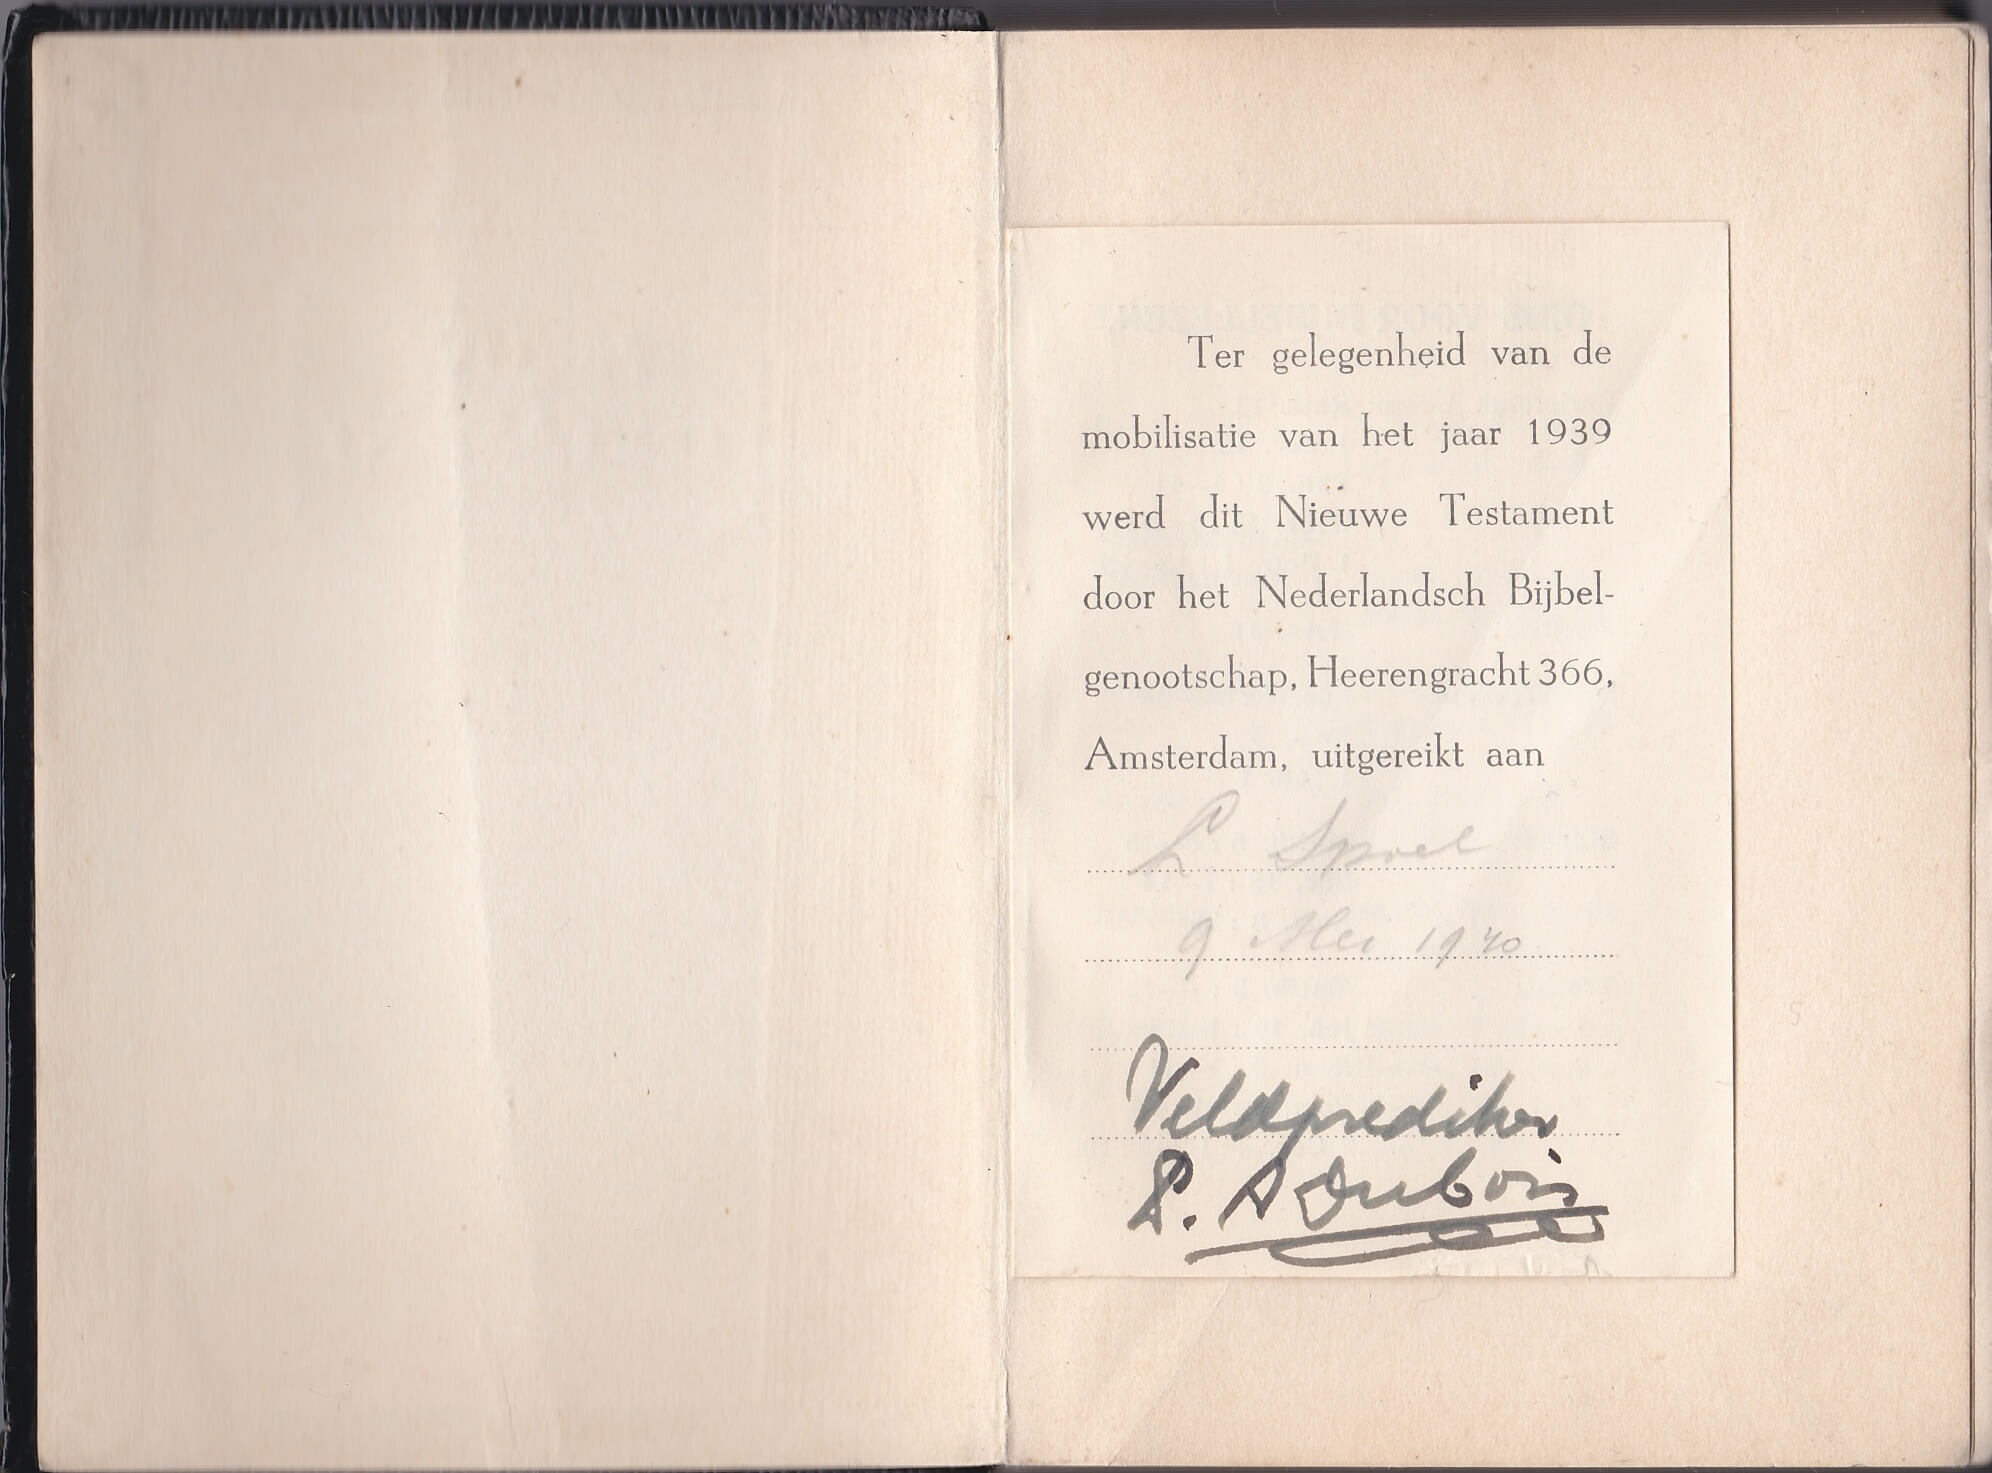 Bijbel mobilisatie 1940 veldprediker A. Dubois